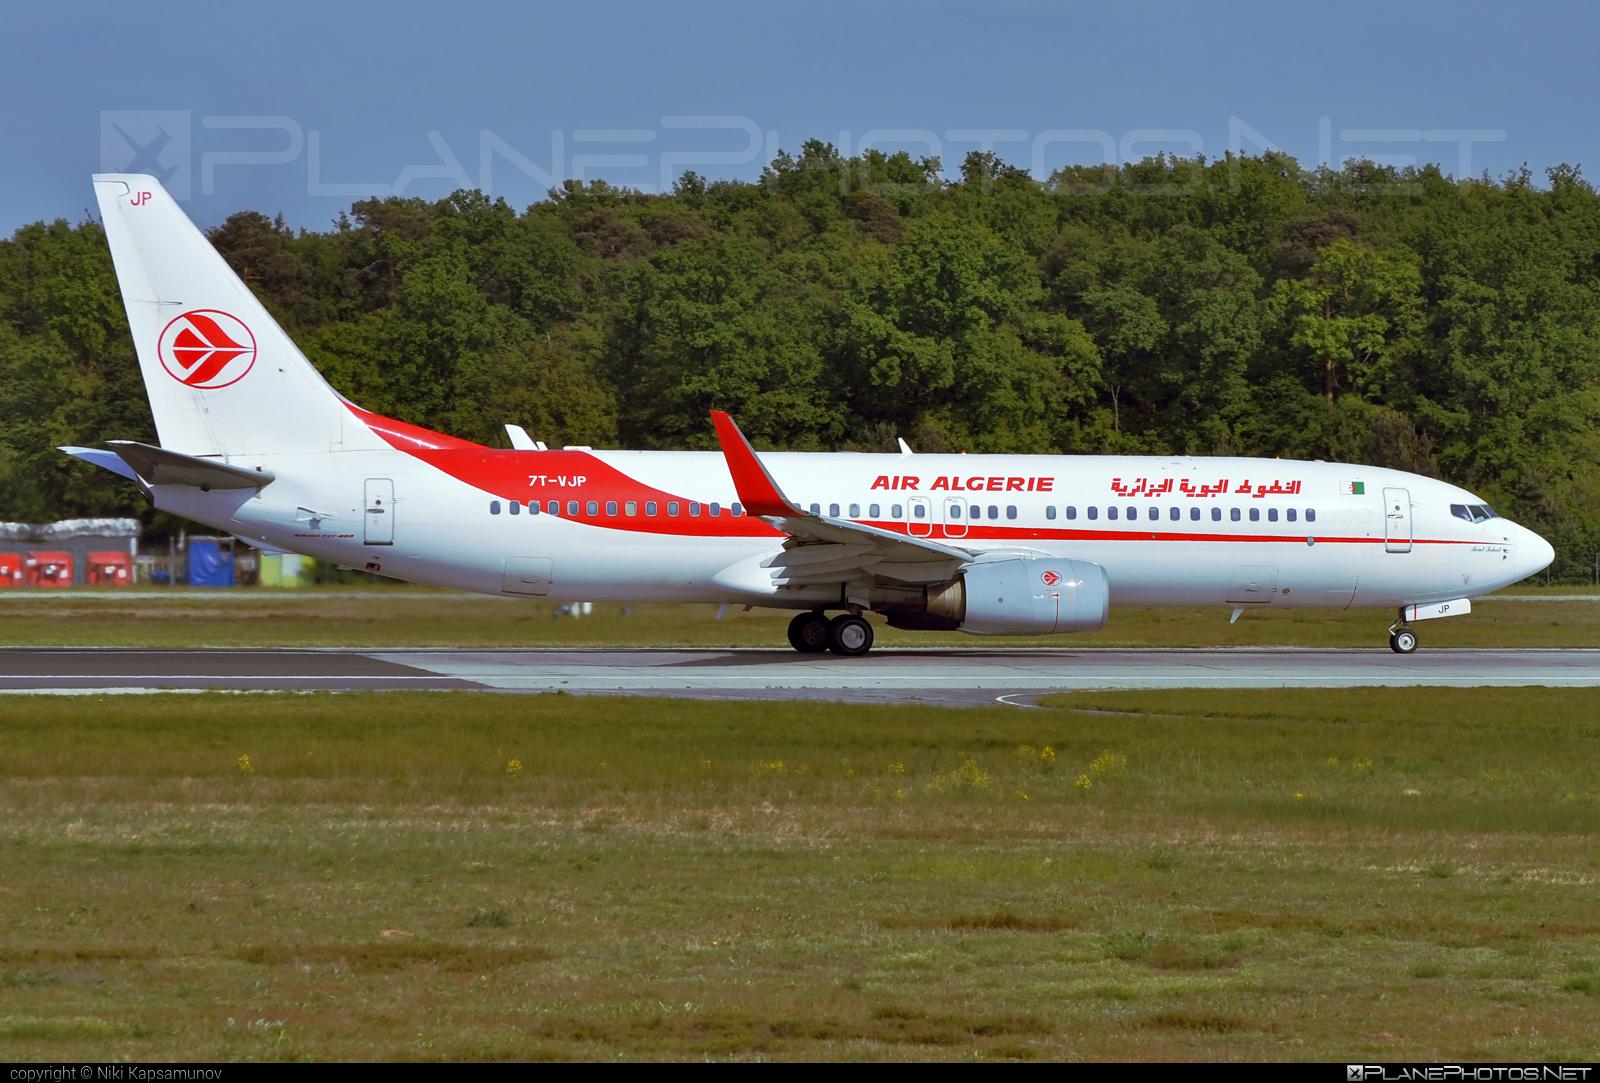 Boeing 737-800 - 7T-VJP operated by Air Algerie #b737 #b737nextgen #b737ng #boeing #boeing737